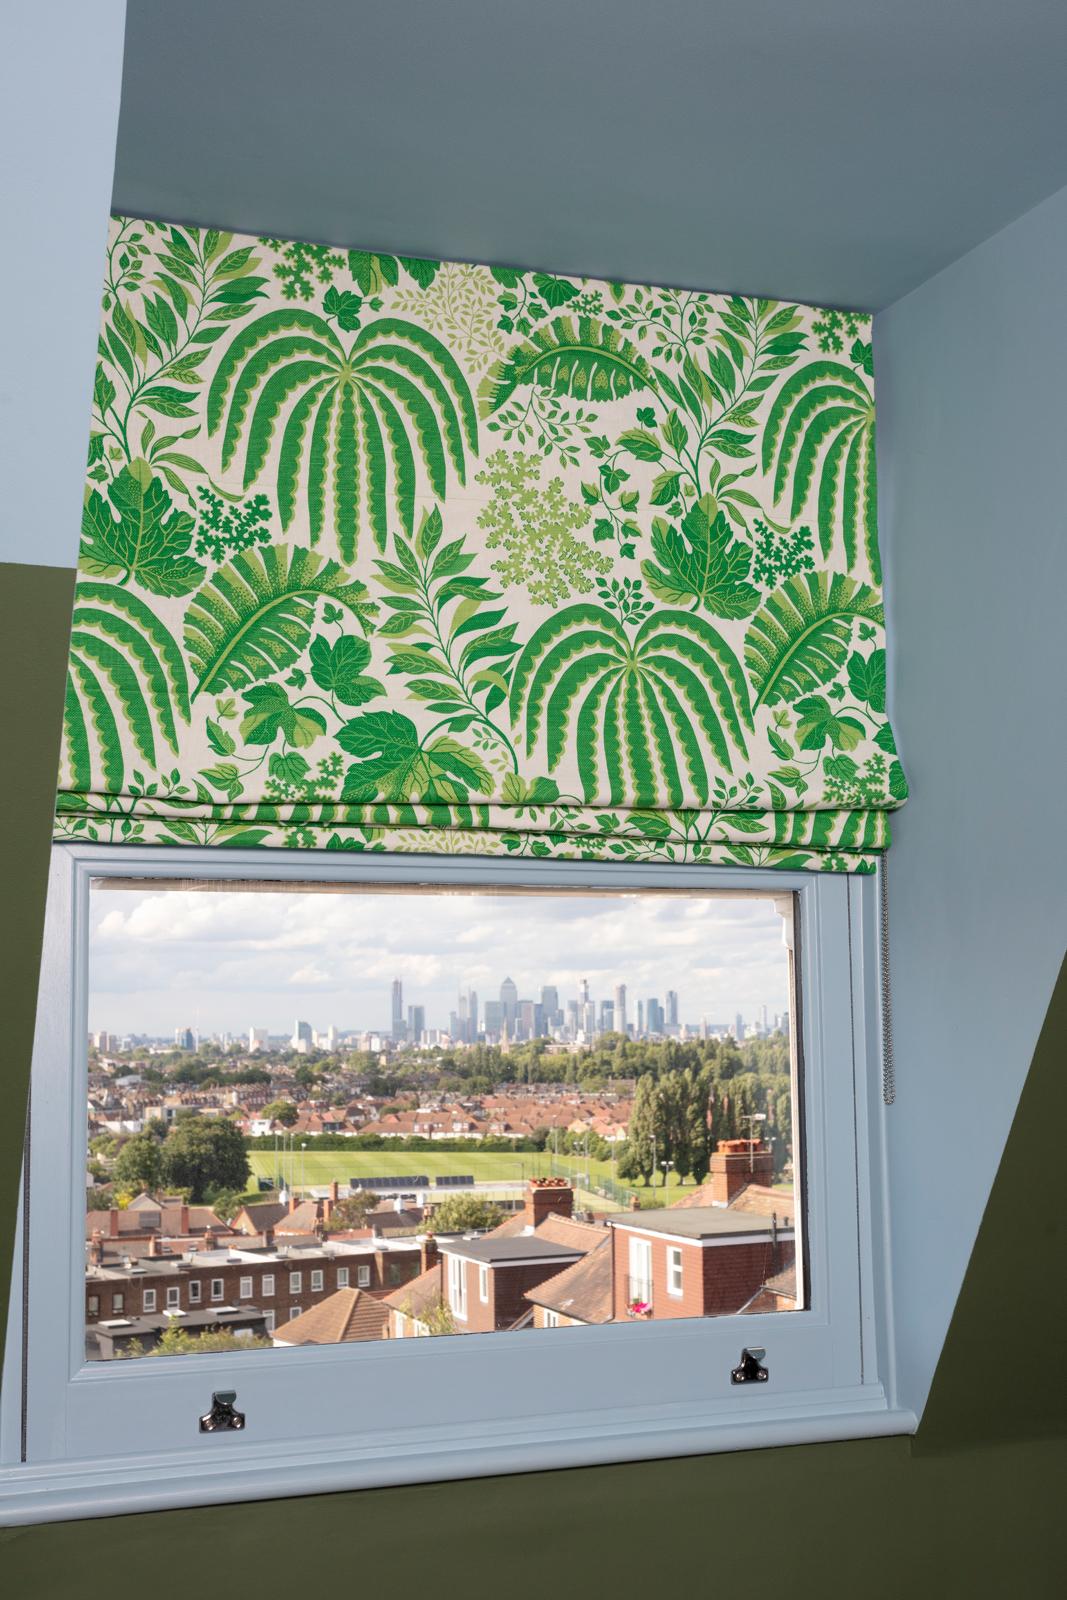 The lucky little b***er's birds-eye view of London